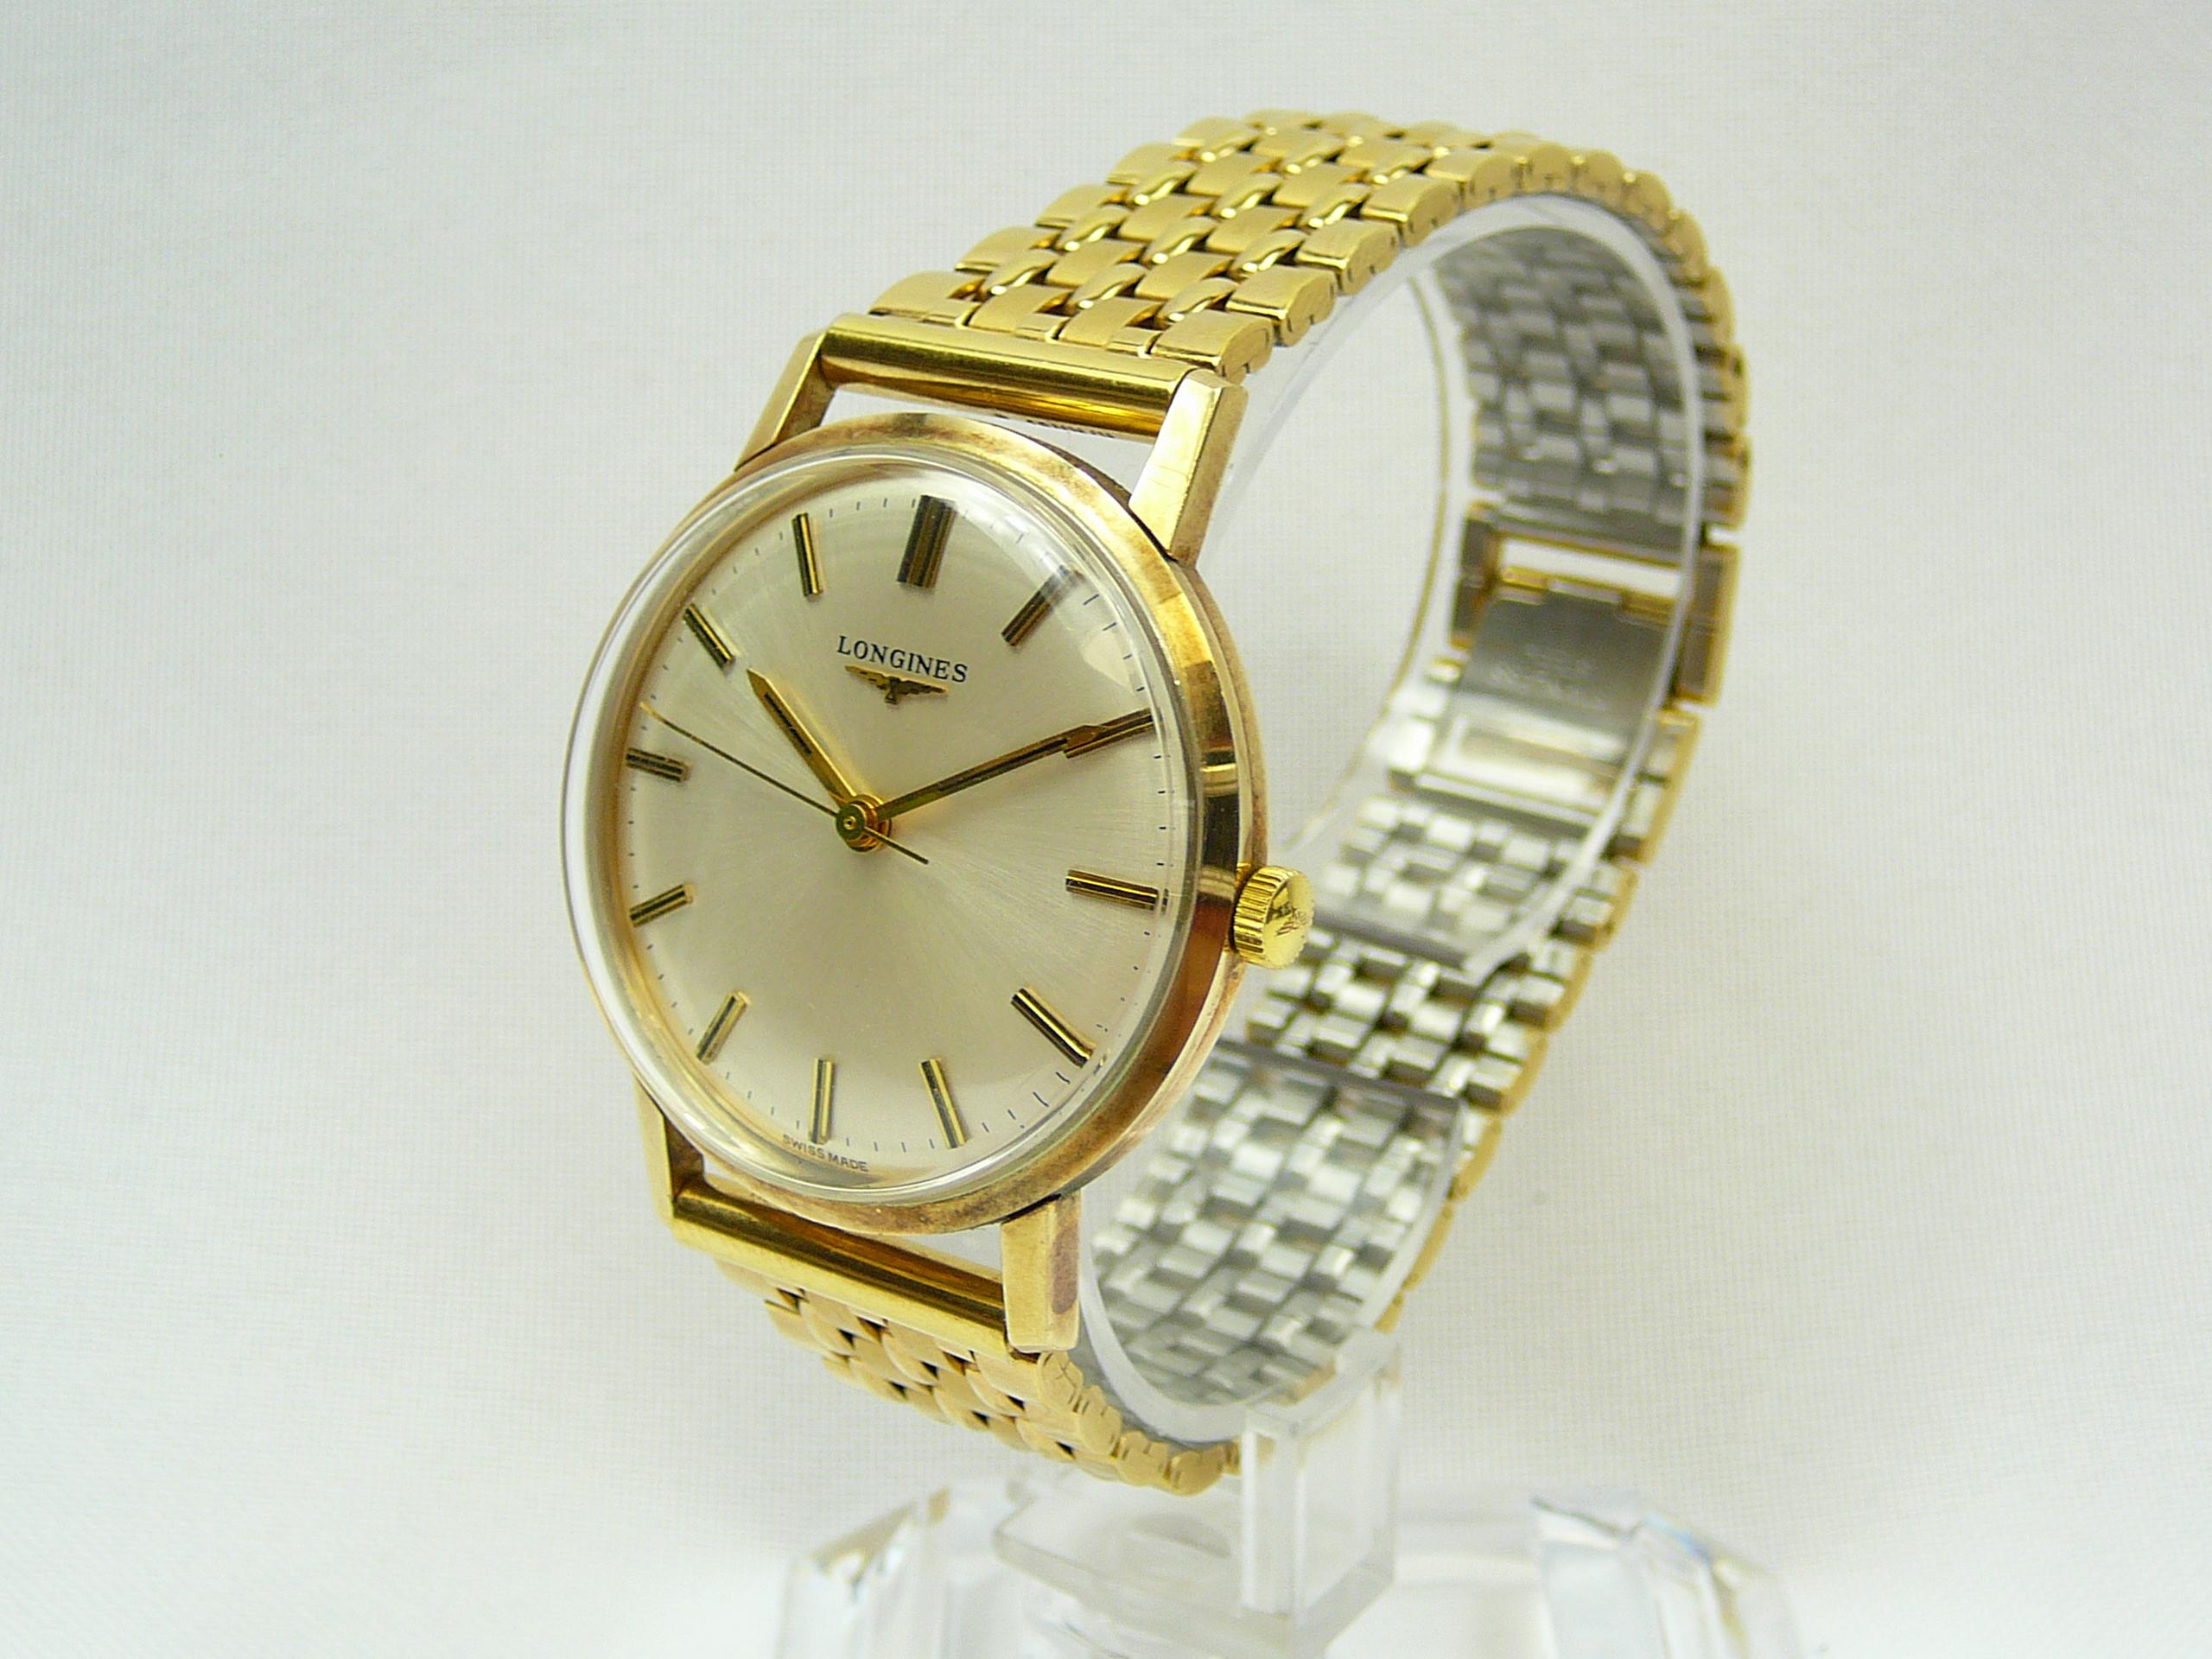 Gents Vintage Gold Longines Wrist Watch